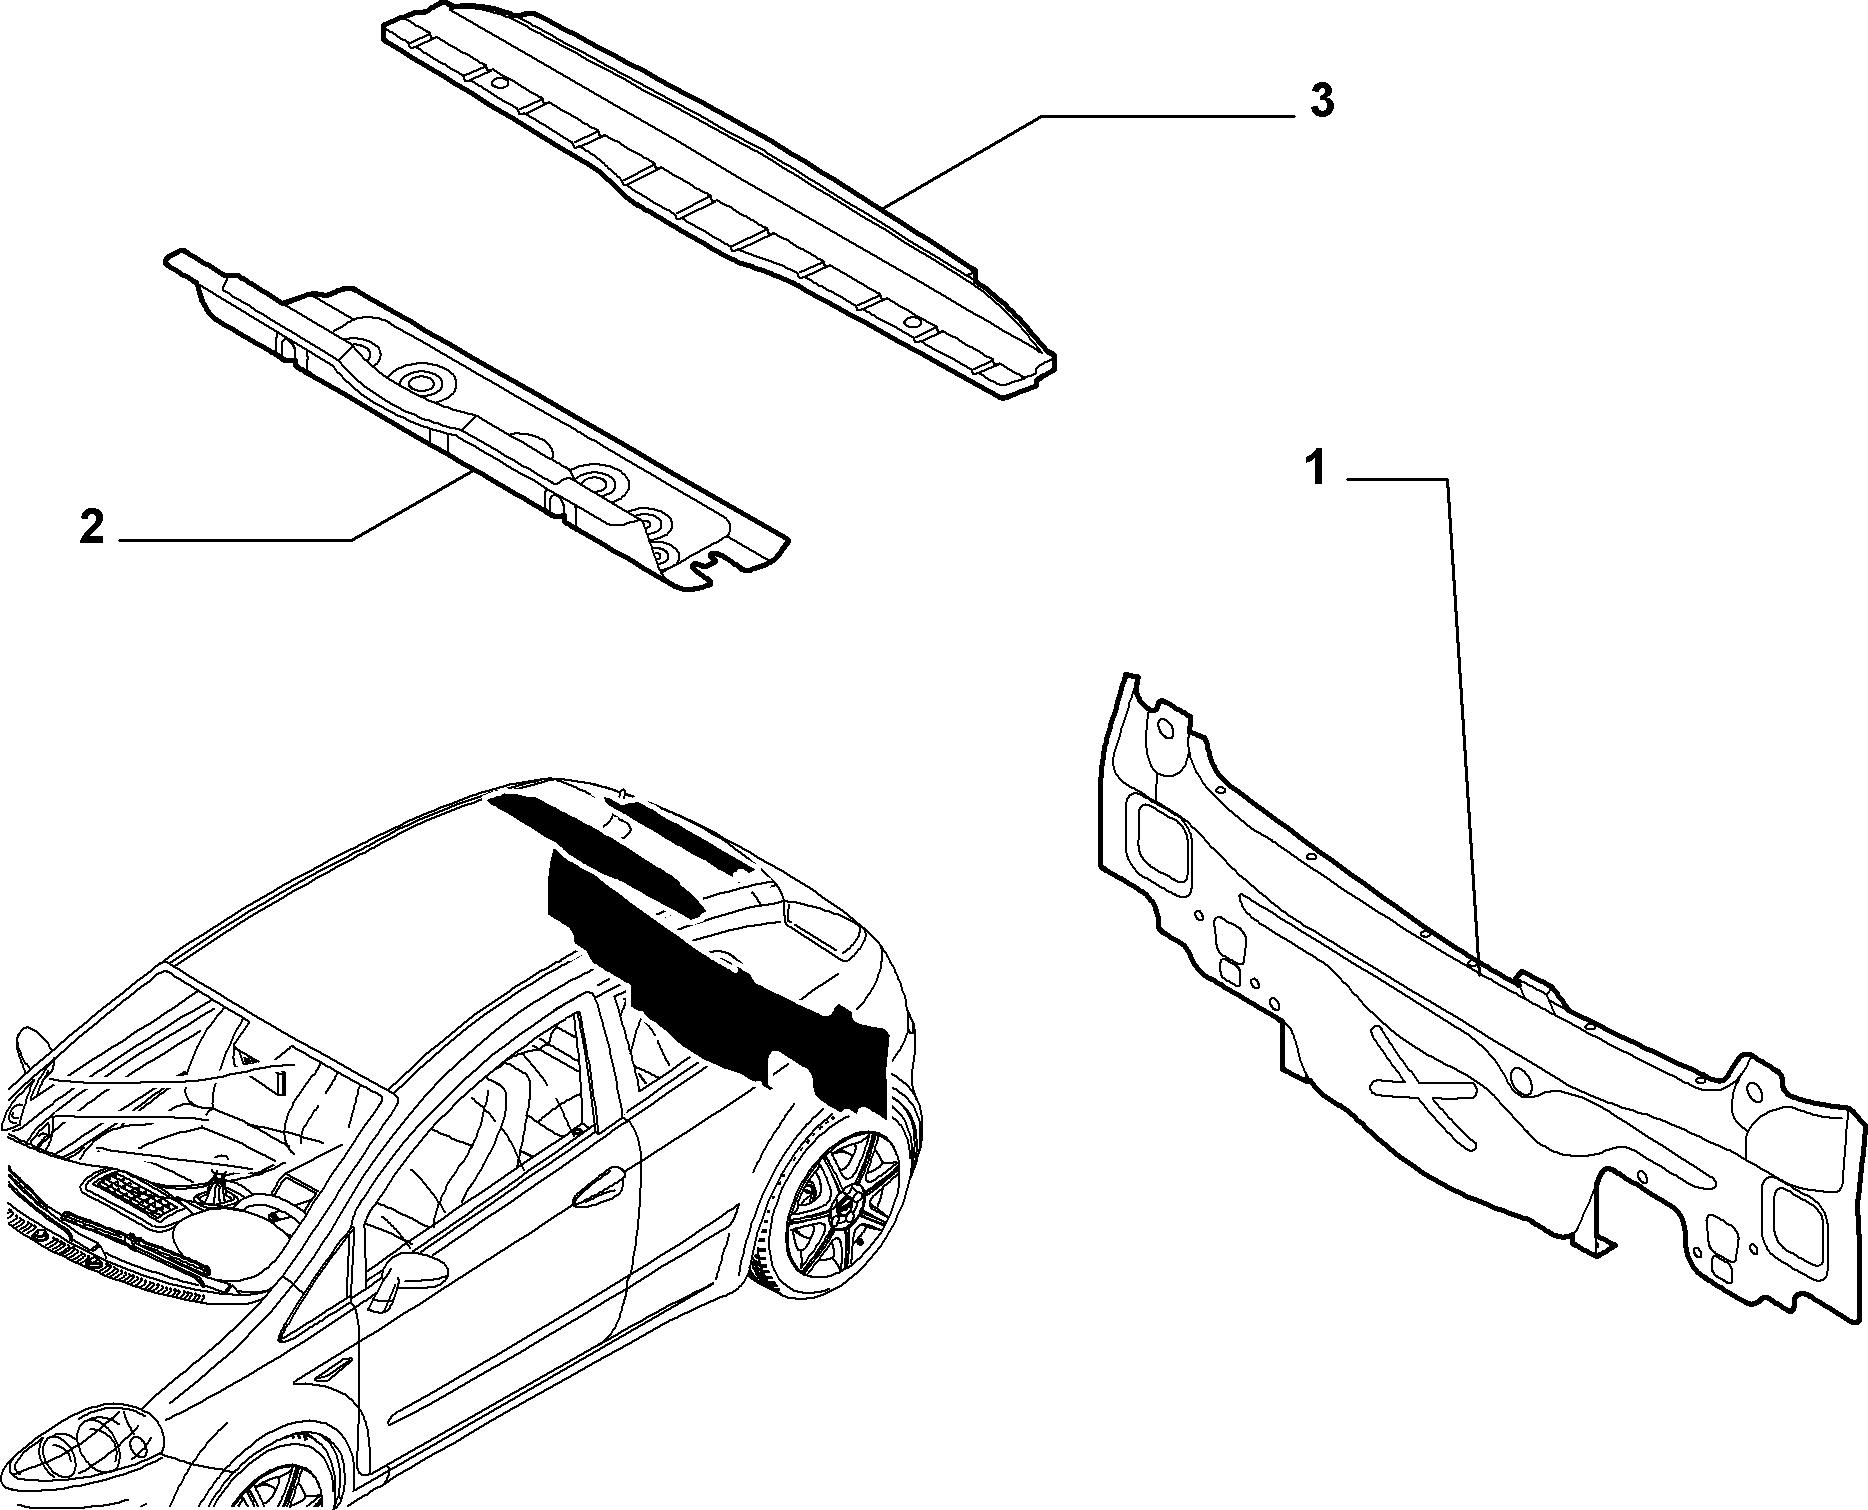 70004-030 REAR CENTRAL CROSSRAIL